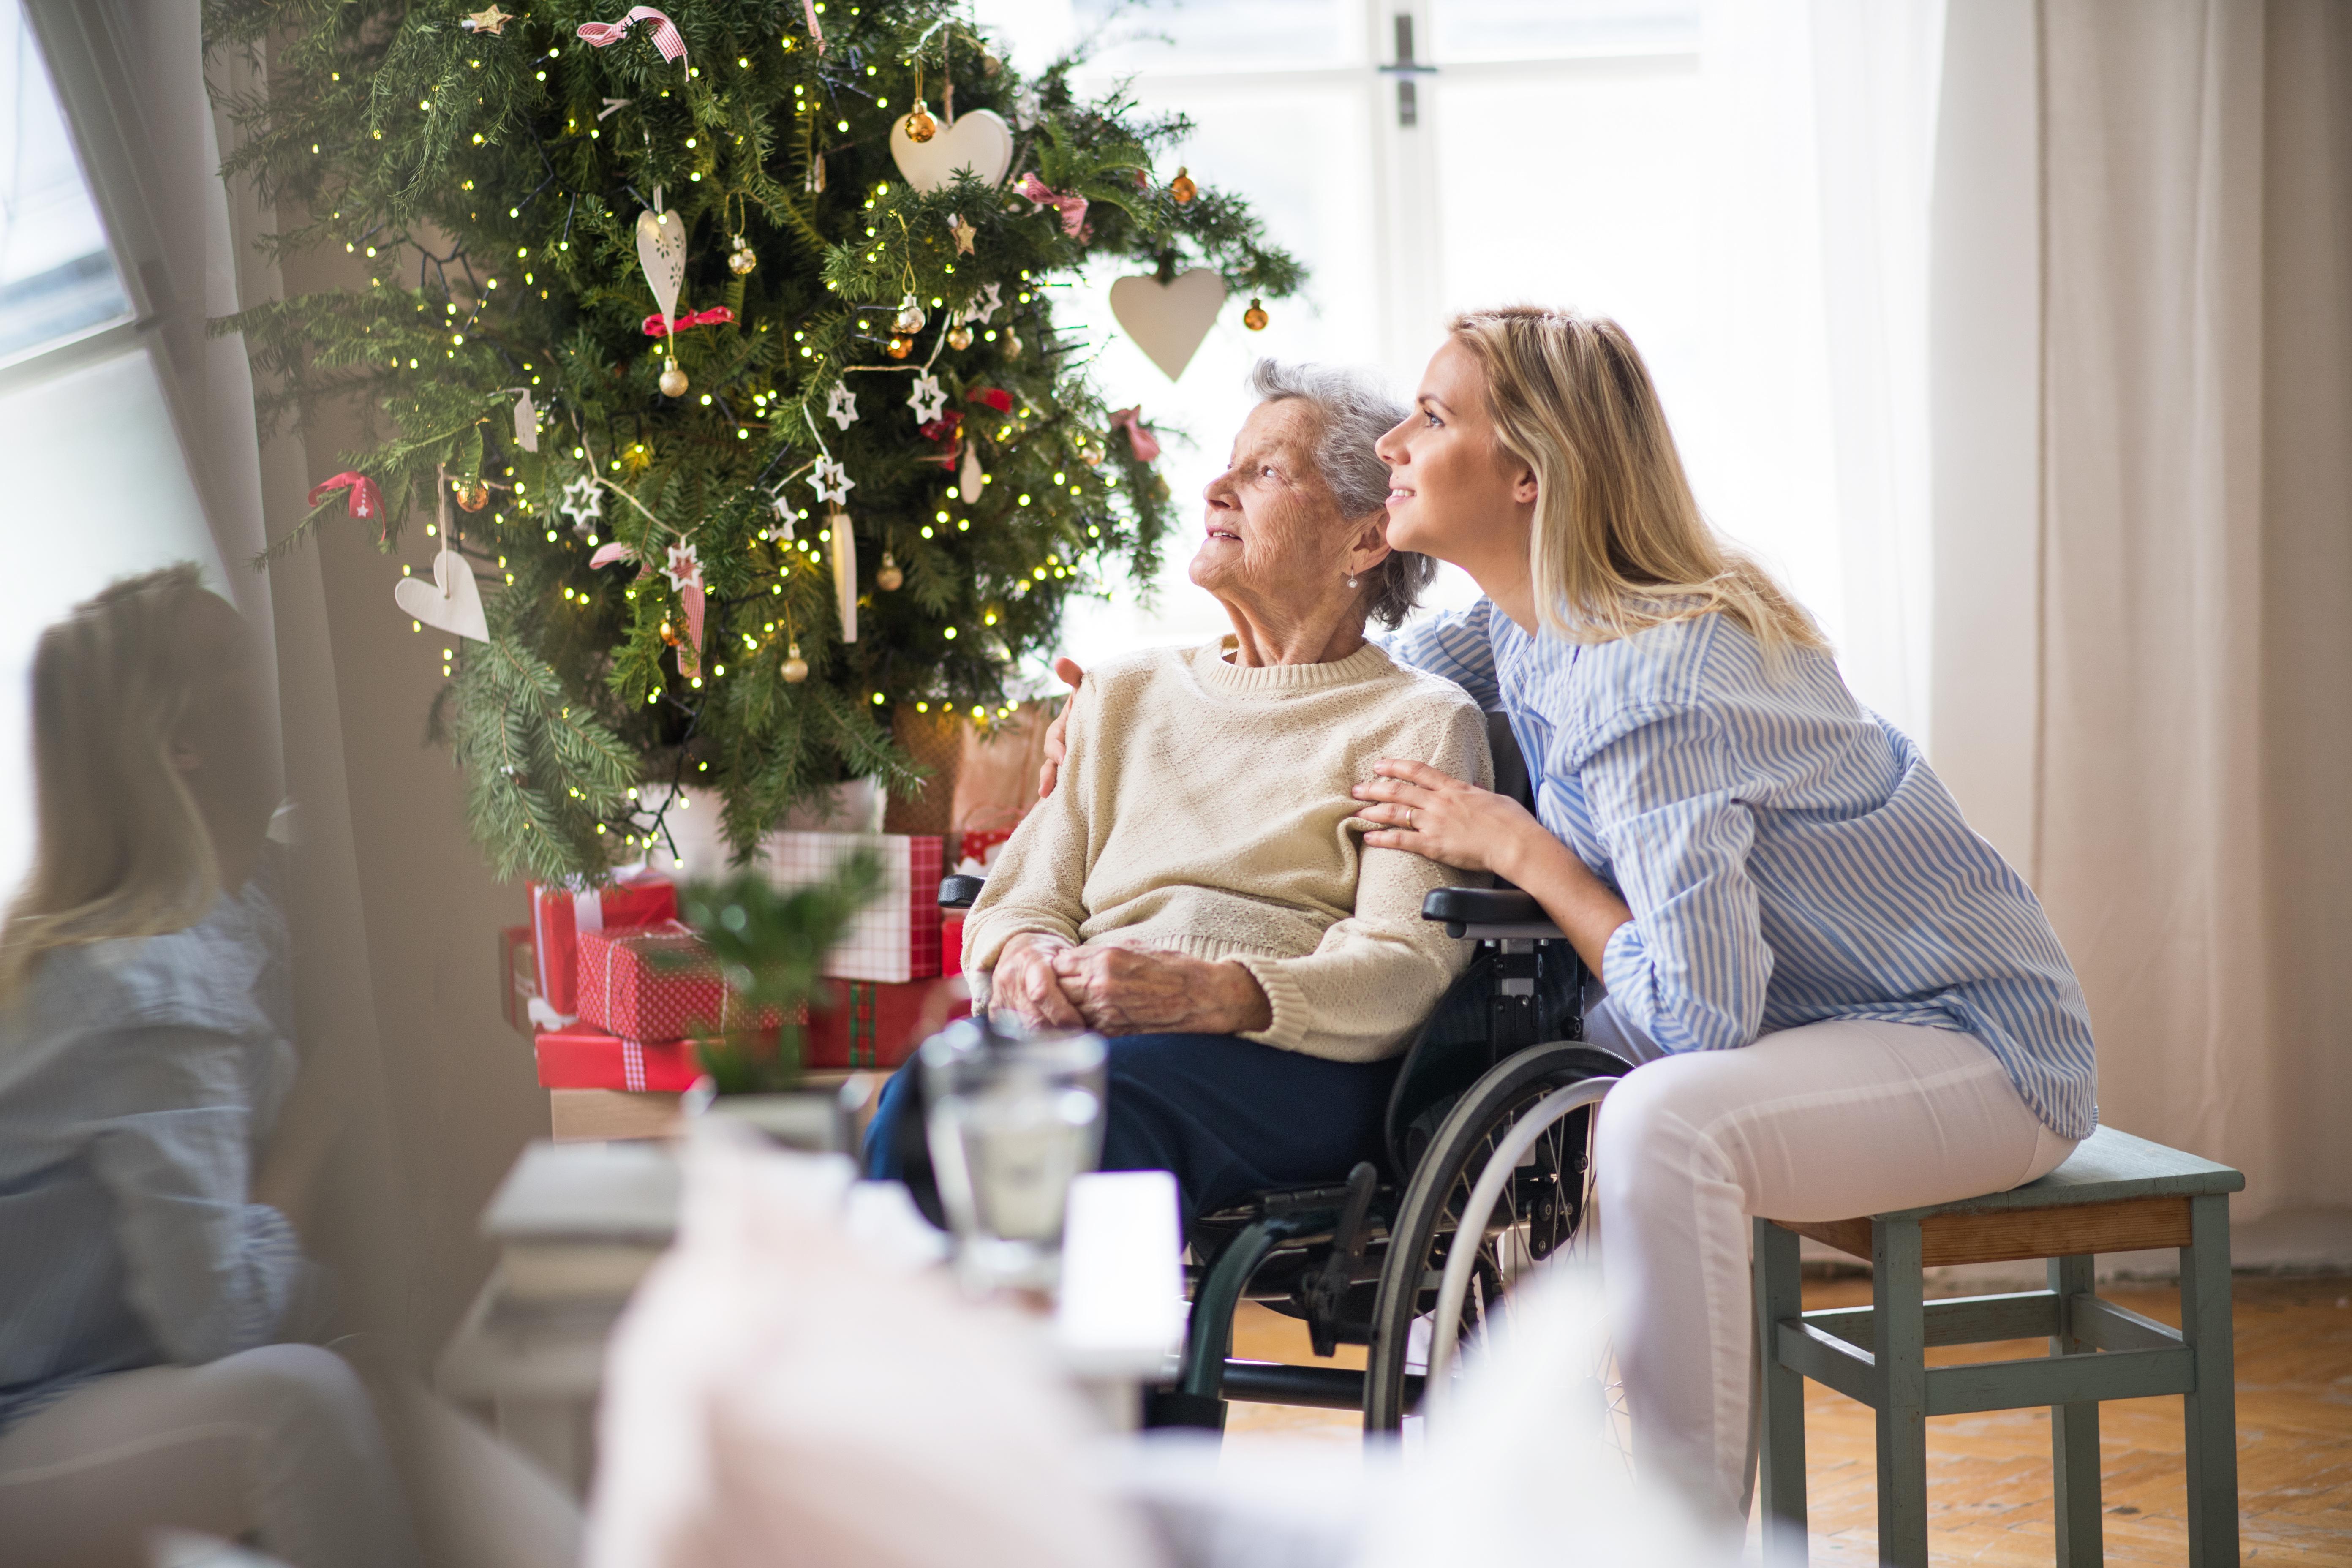 Holiday Spirits: Brightening the Holidays for Seniors